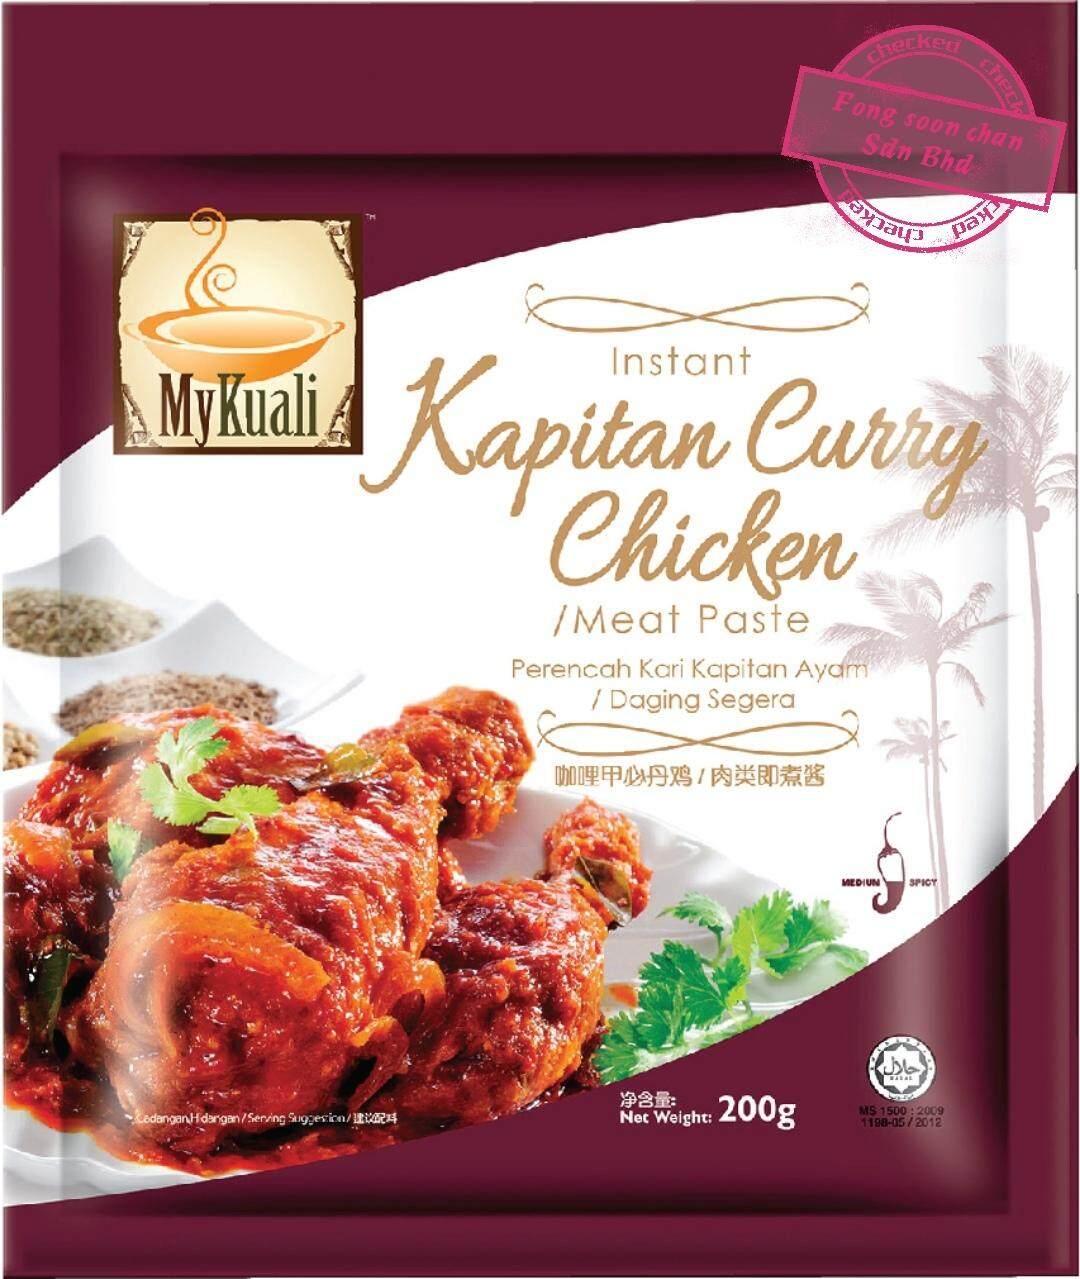 [FSC] Mykuali Instant Kapitan Curry Chicken/Meat Paste 200gm